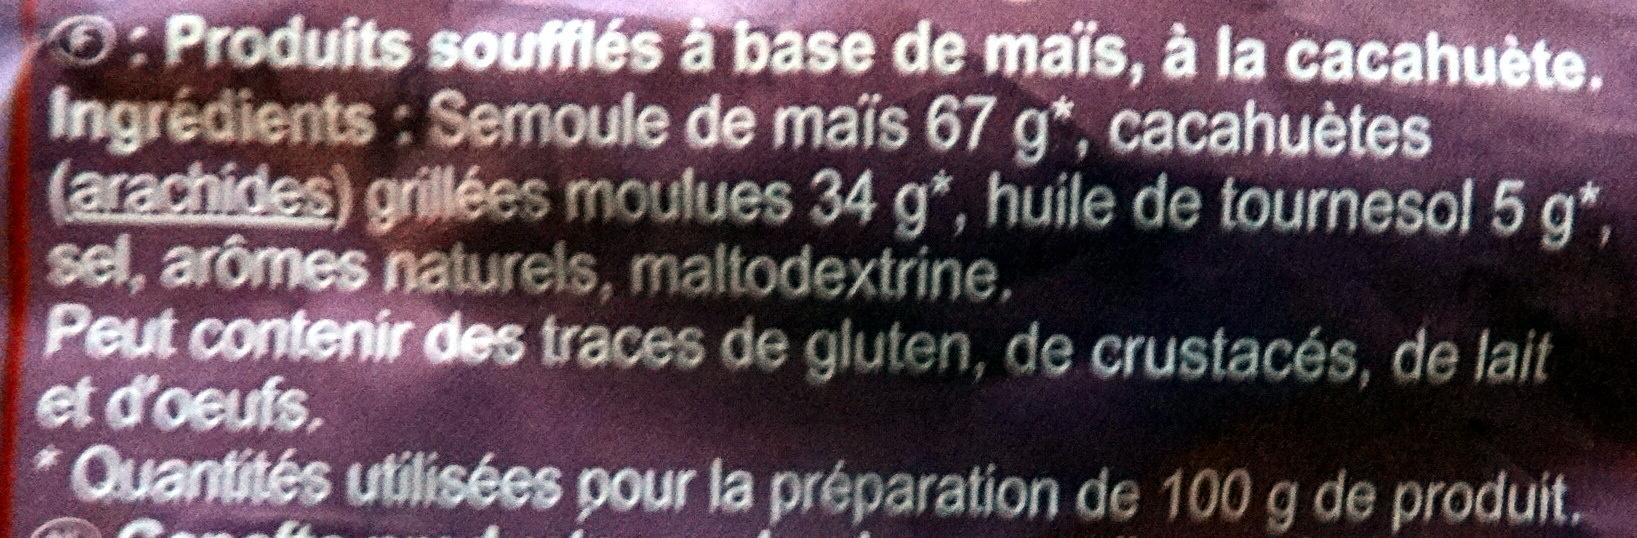 Croustillants à la Cacahuète - Ingrediënten - fr